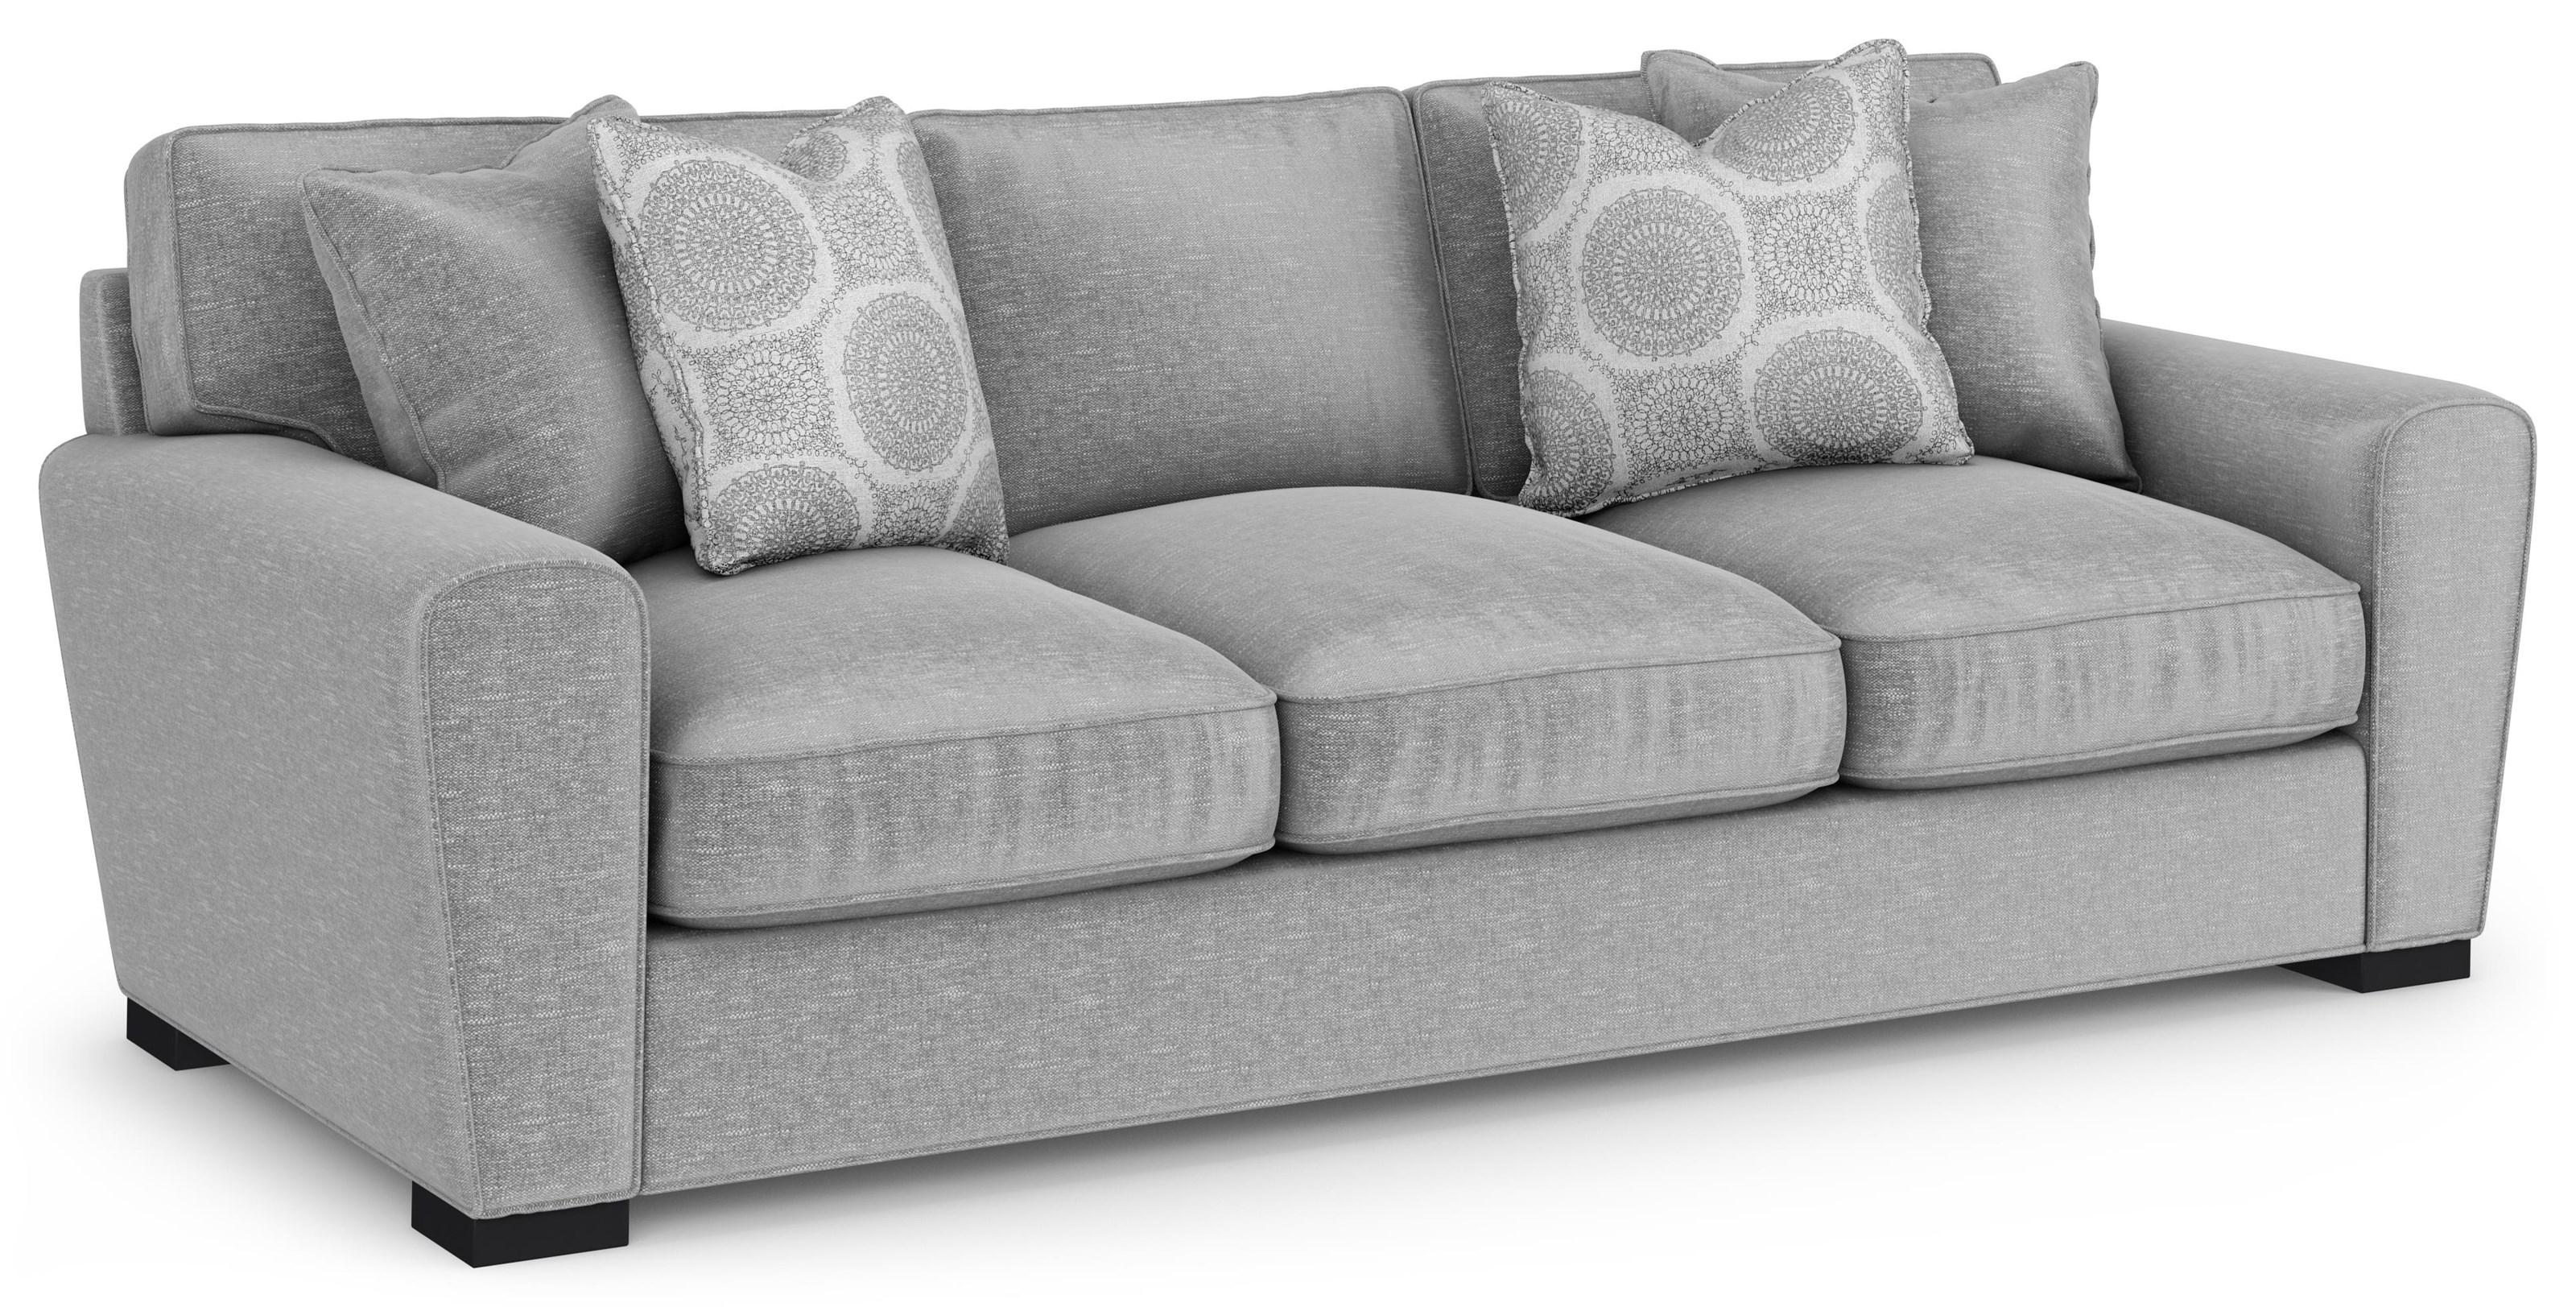 Monroe Monroe Sofa by Sunset Home at Walker's Furniture